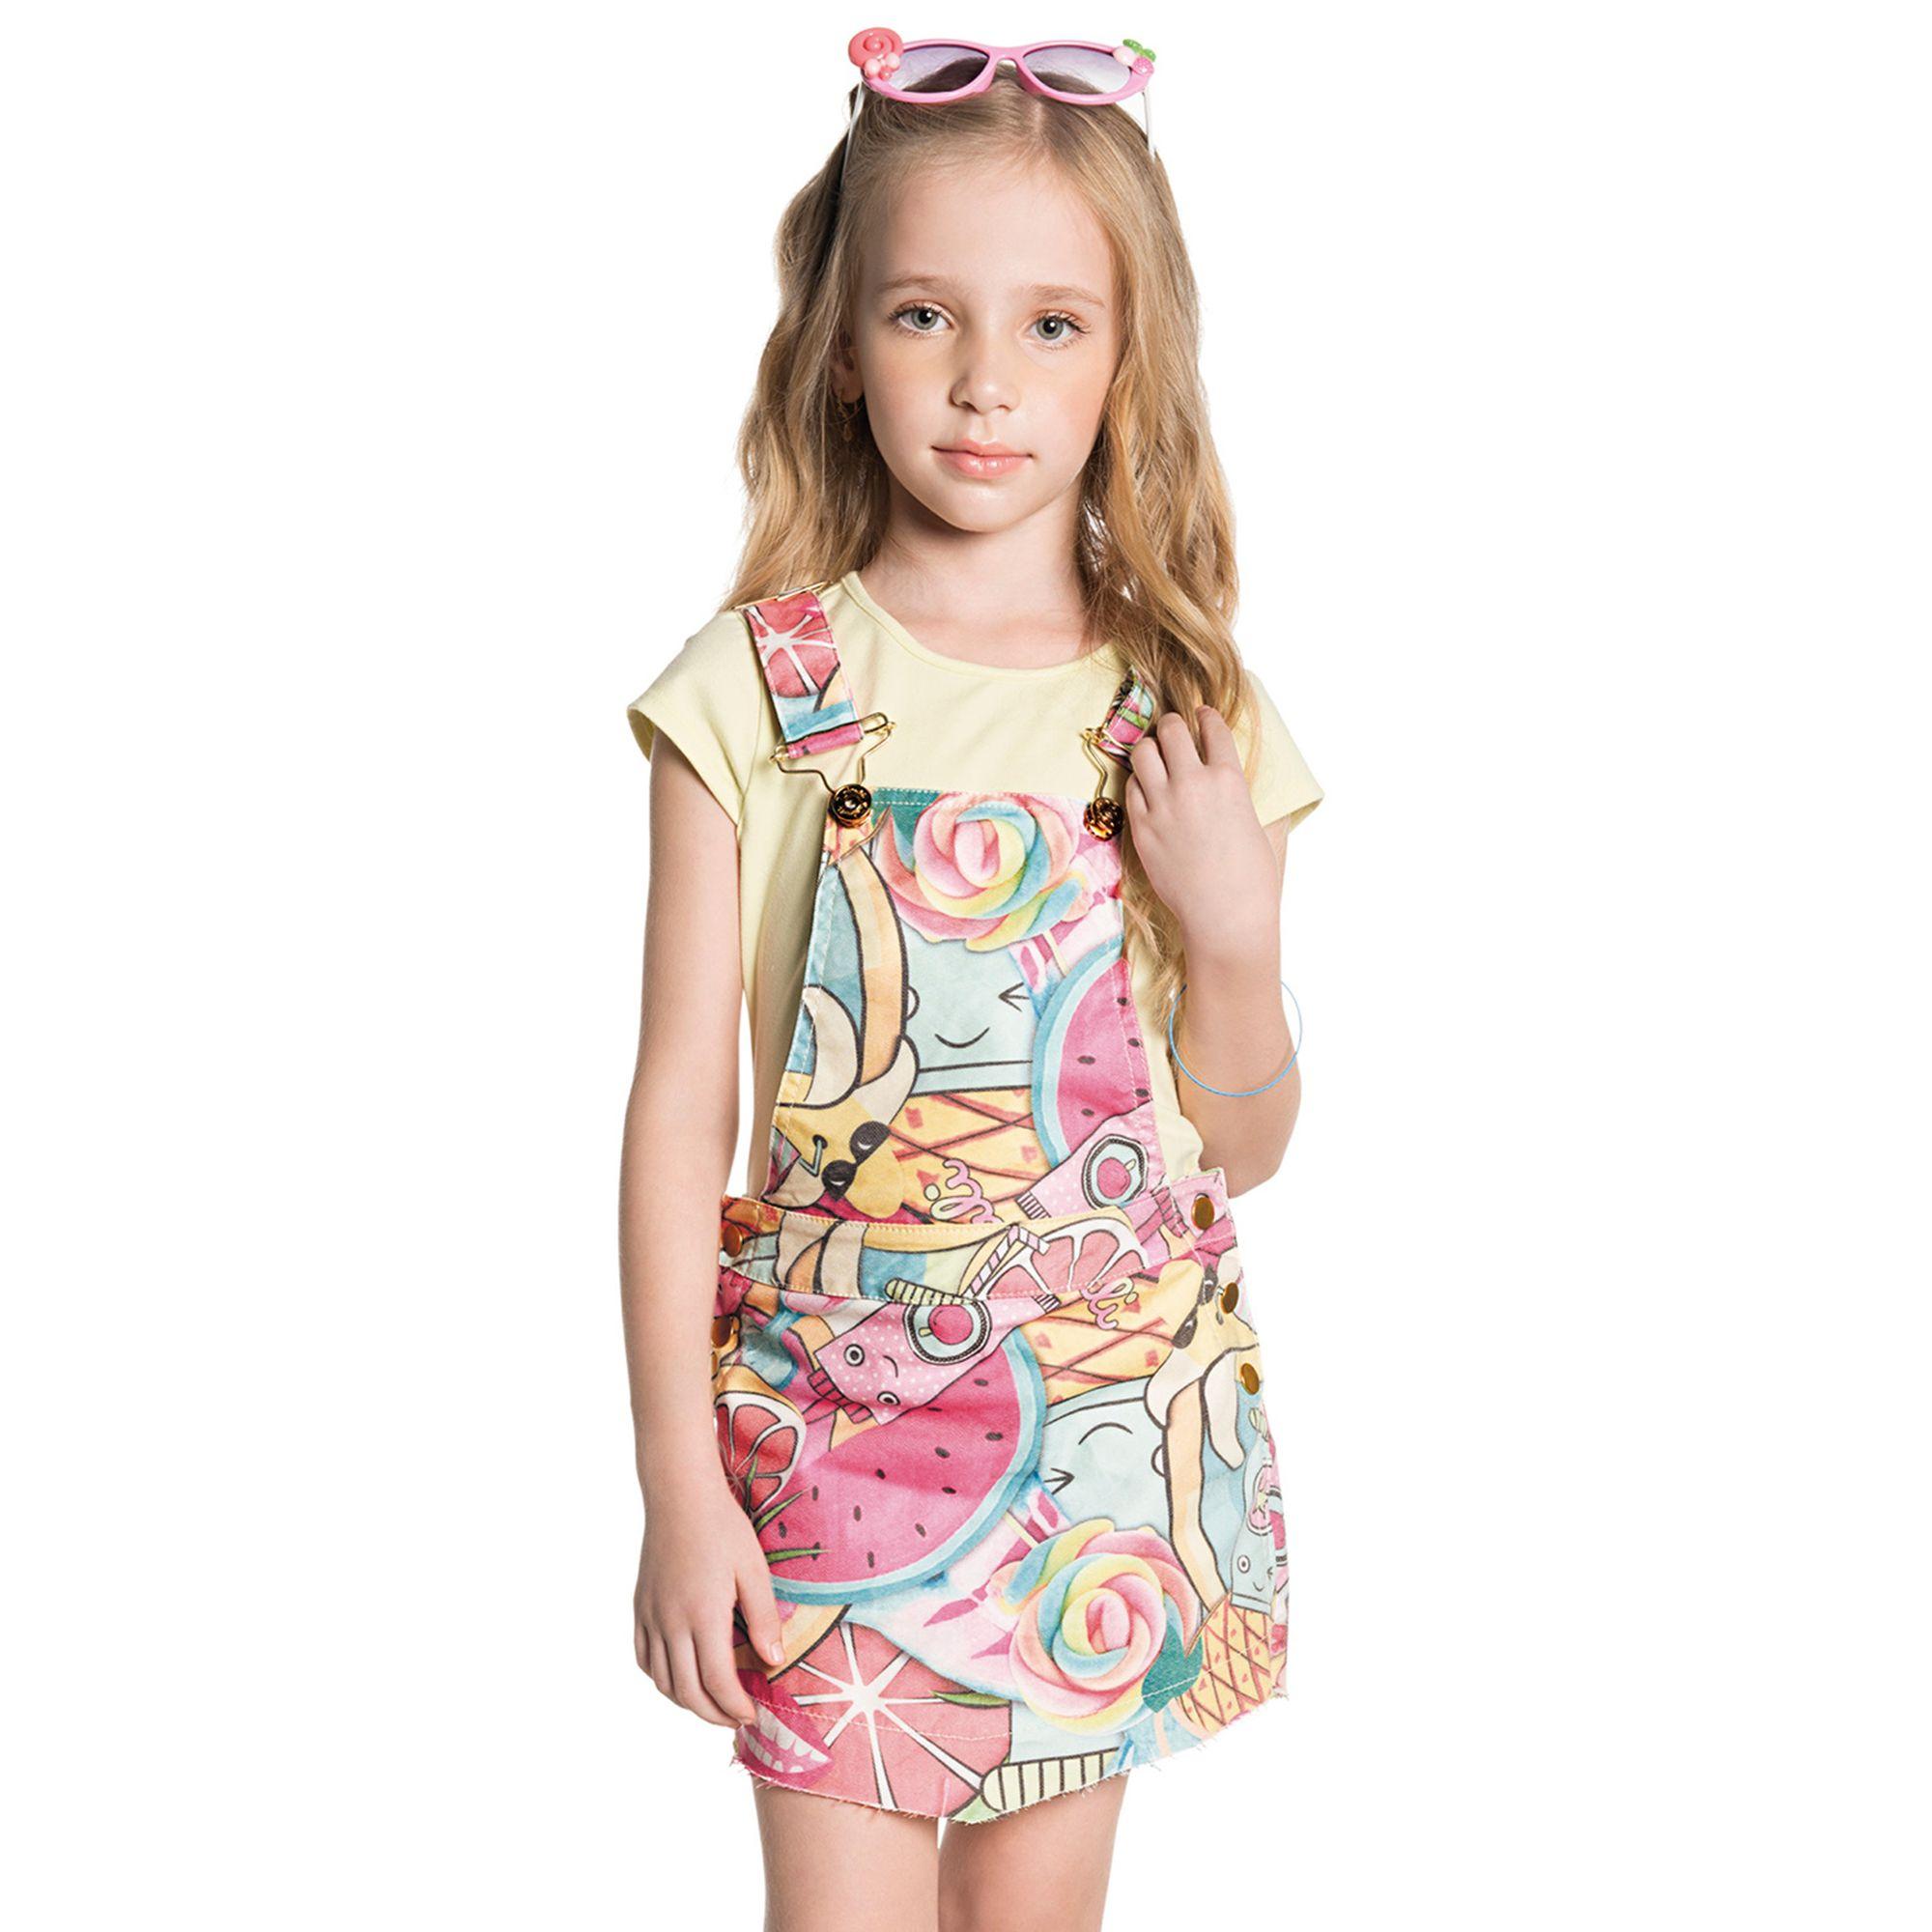 jardineira-infantil-menina-divertida-verao-ninali